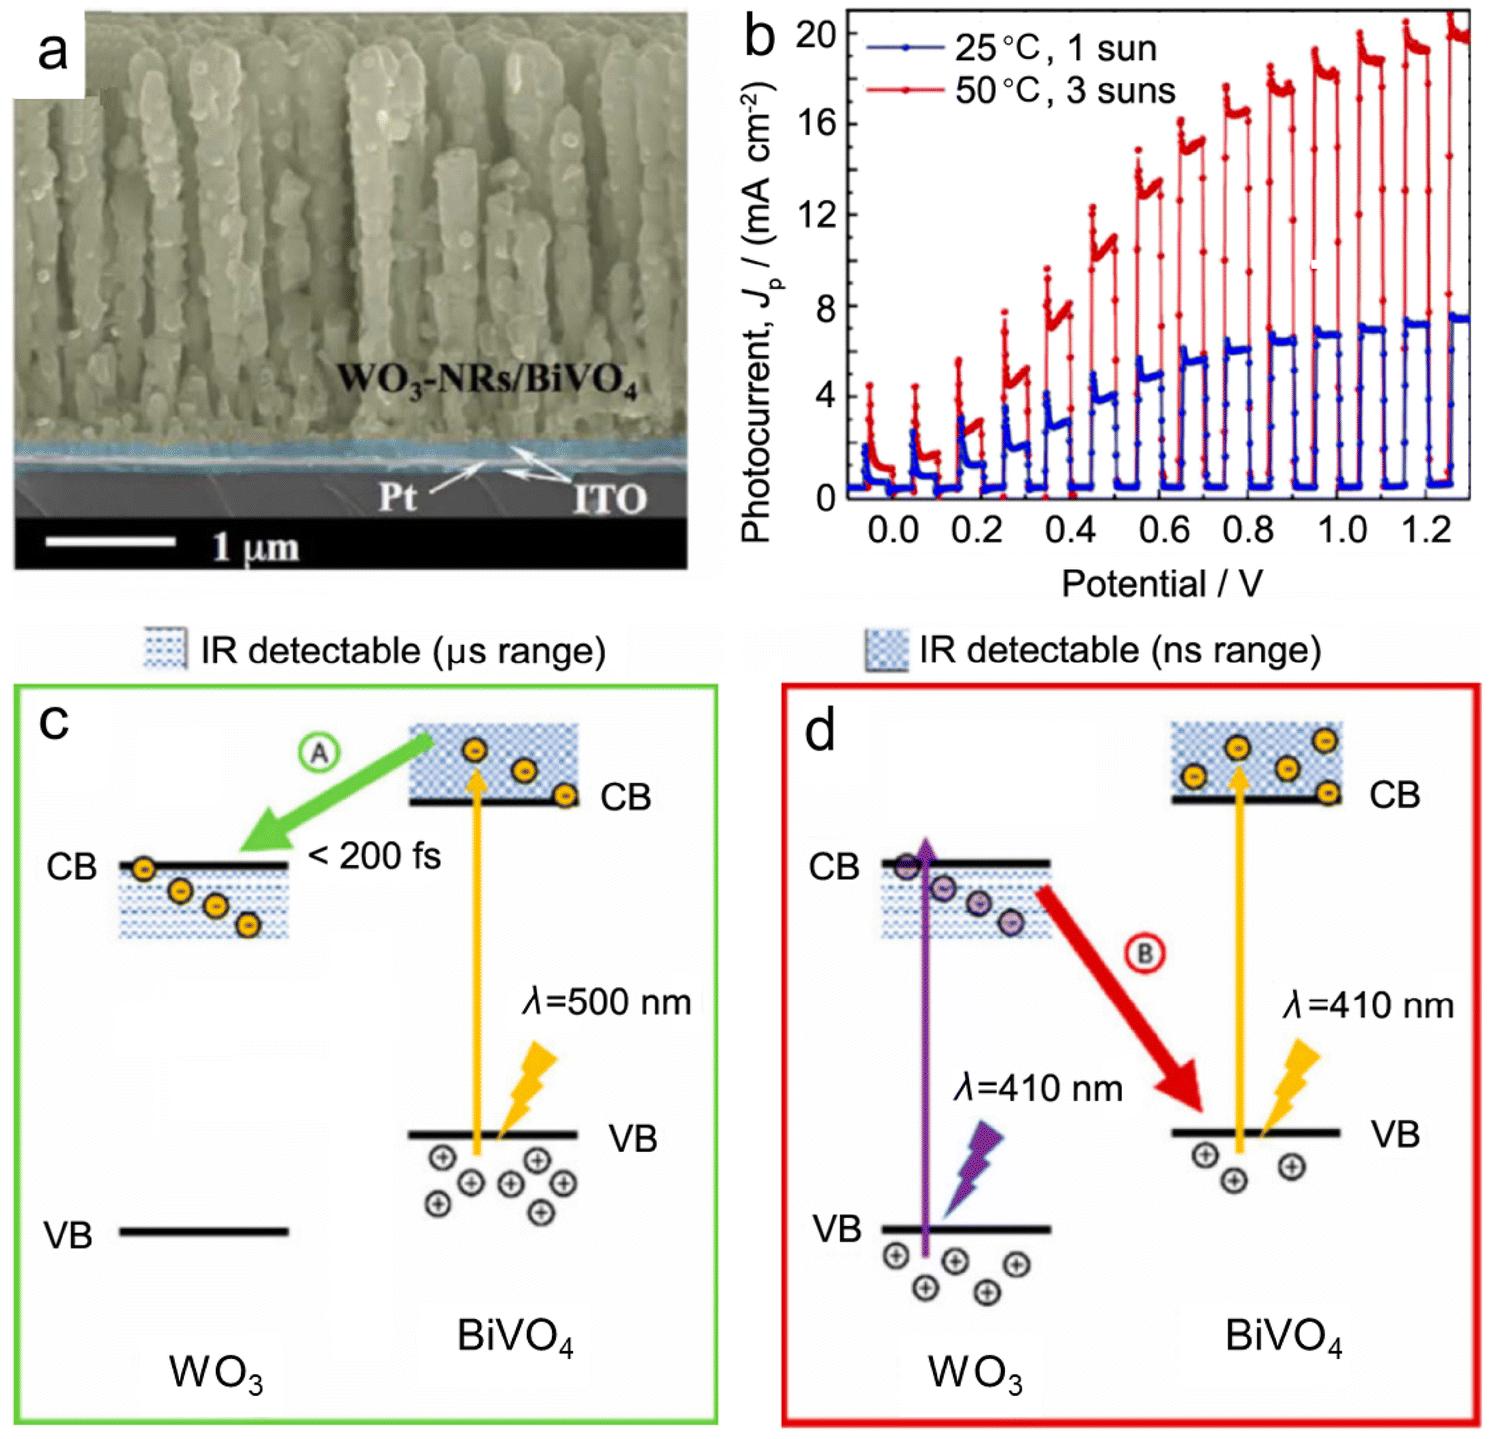 Recent progress of tungsten- and molybdenum-based